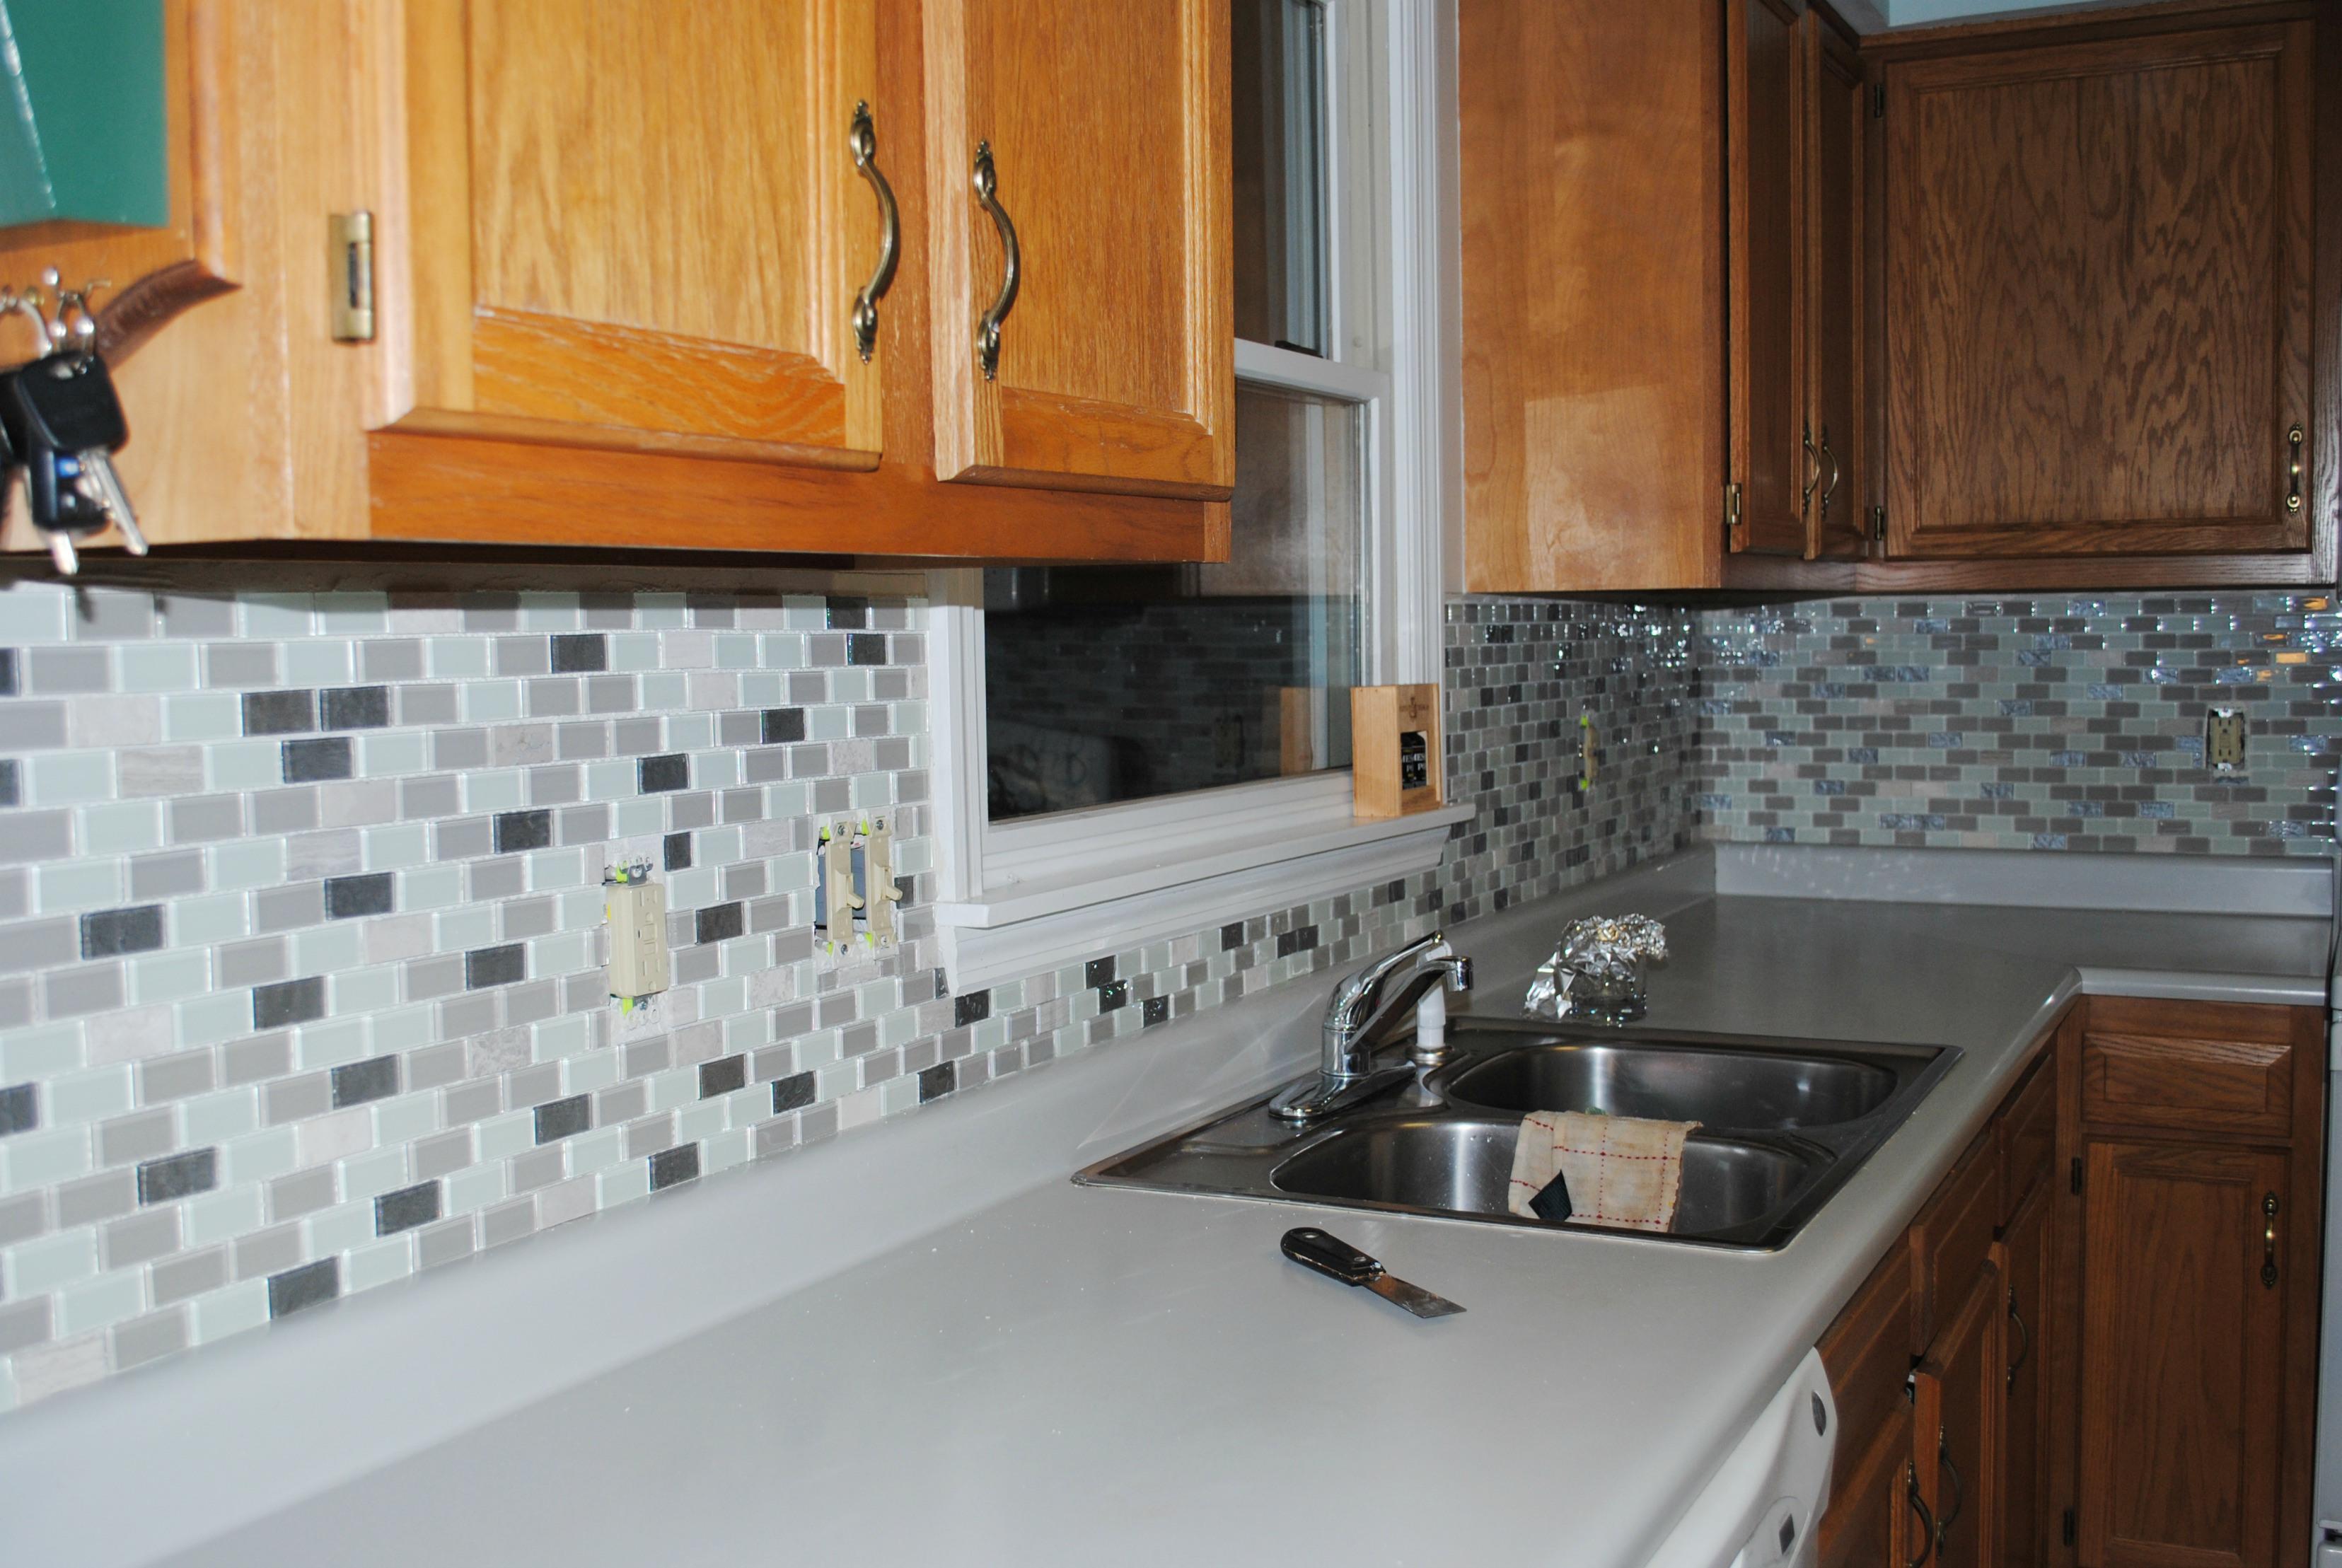 Glossy Groutless Kitchen Backsplash Wood Top Cabinet System Under Storage Pure White Laminate